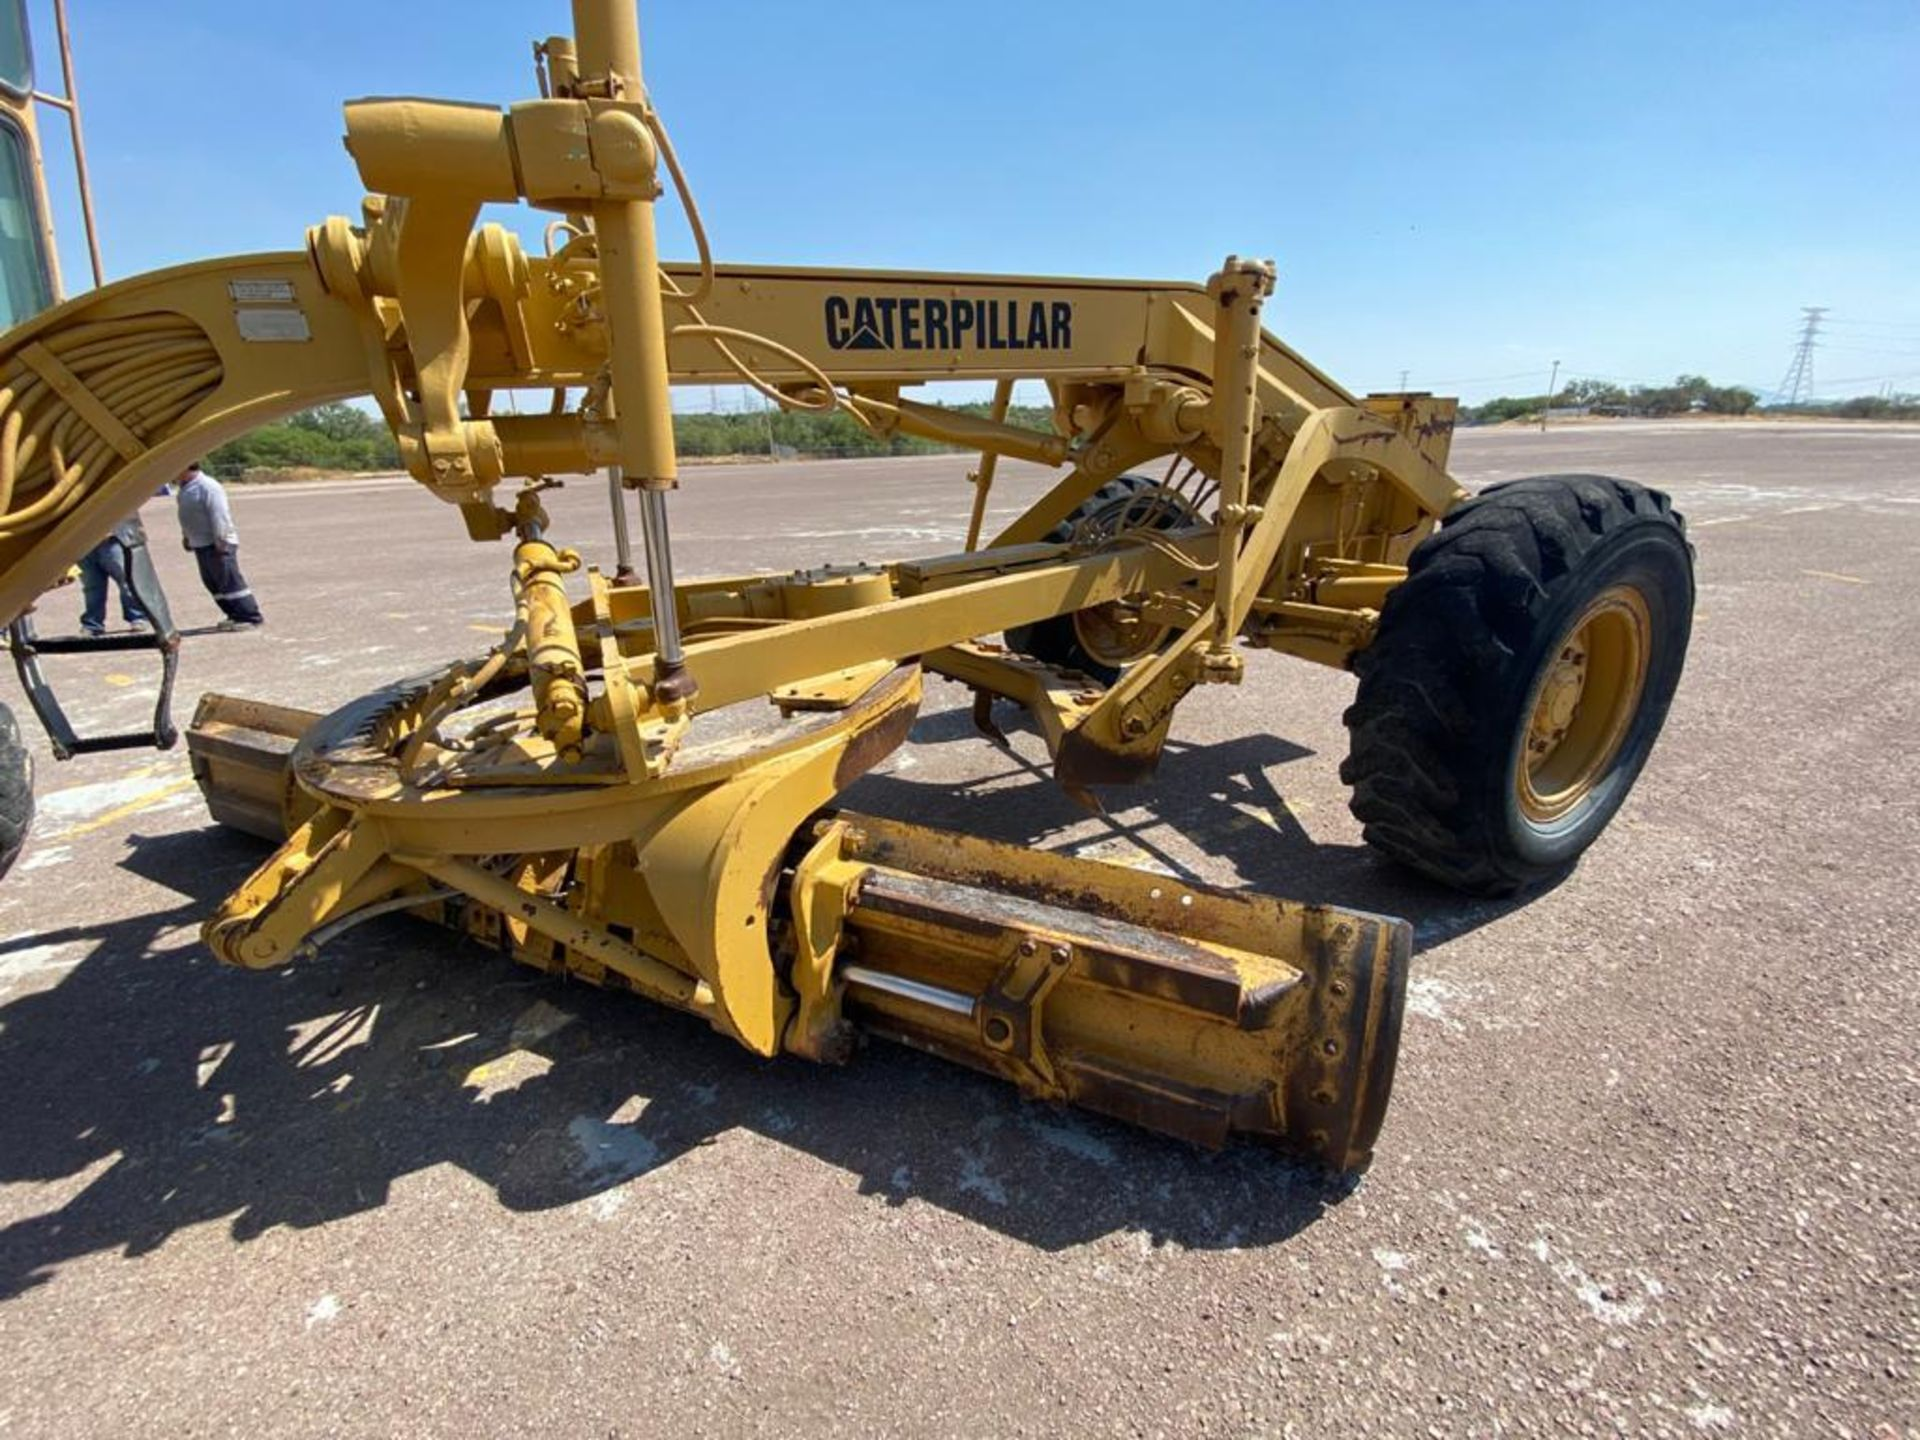 Caterpillar 120G Motor Grader, Serial number 87V09646, Motor number PQ883-2/07Z28983 - Image 22 of 61